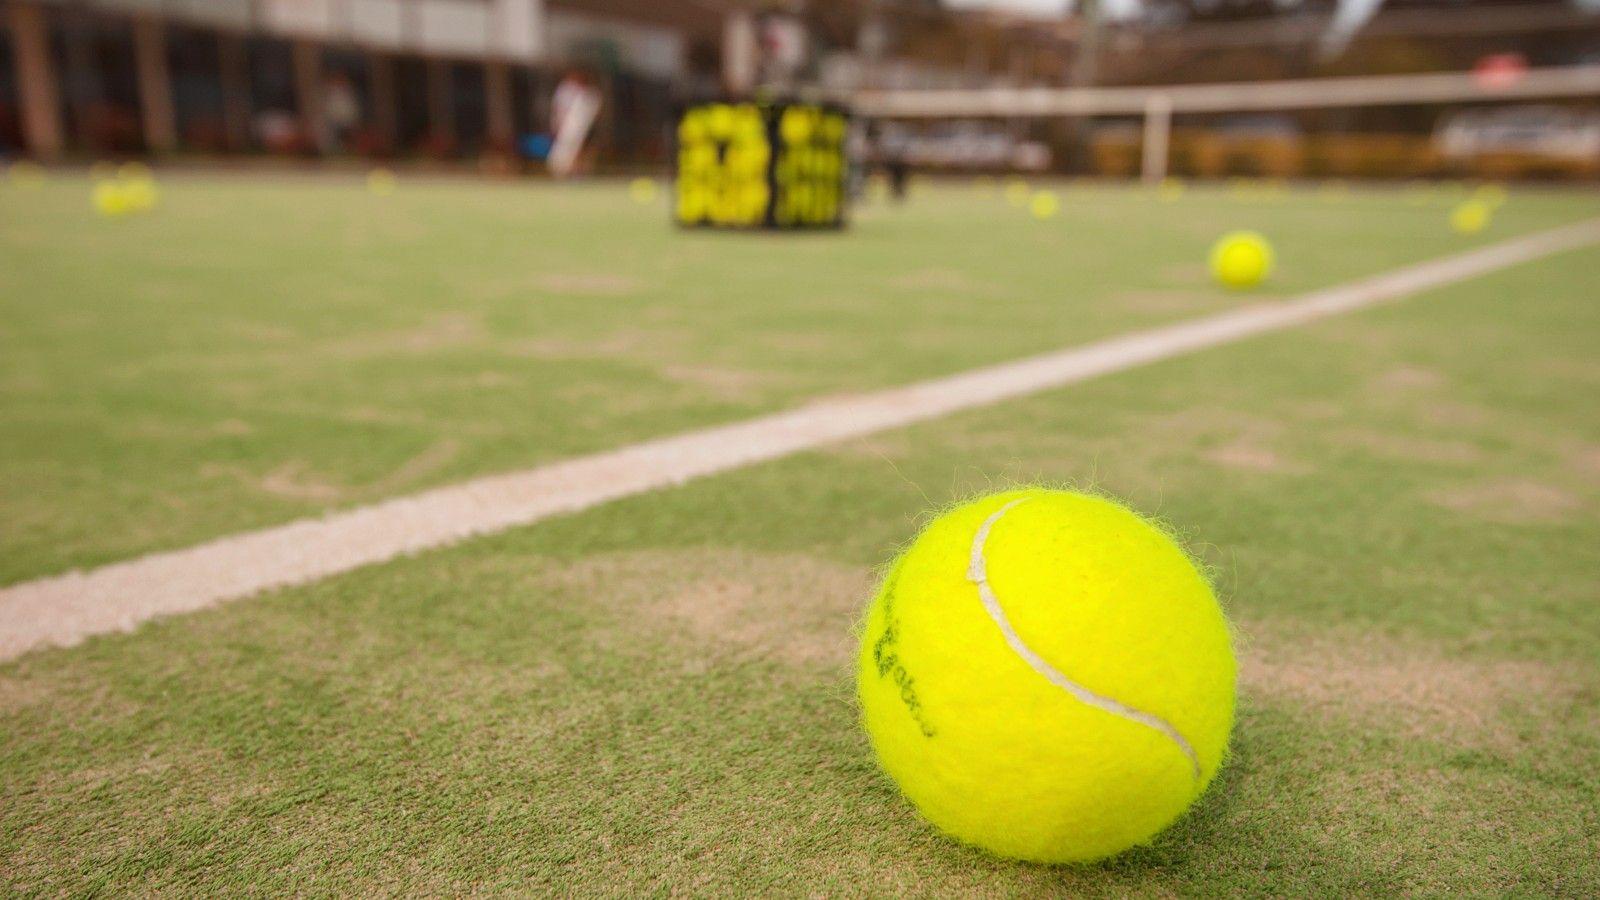 Tennis balls on tennis court banner image